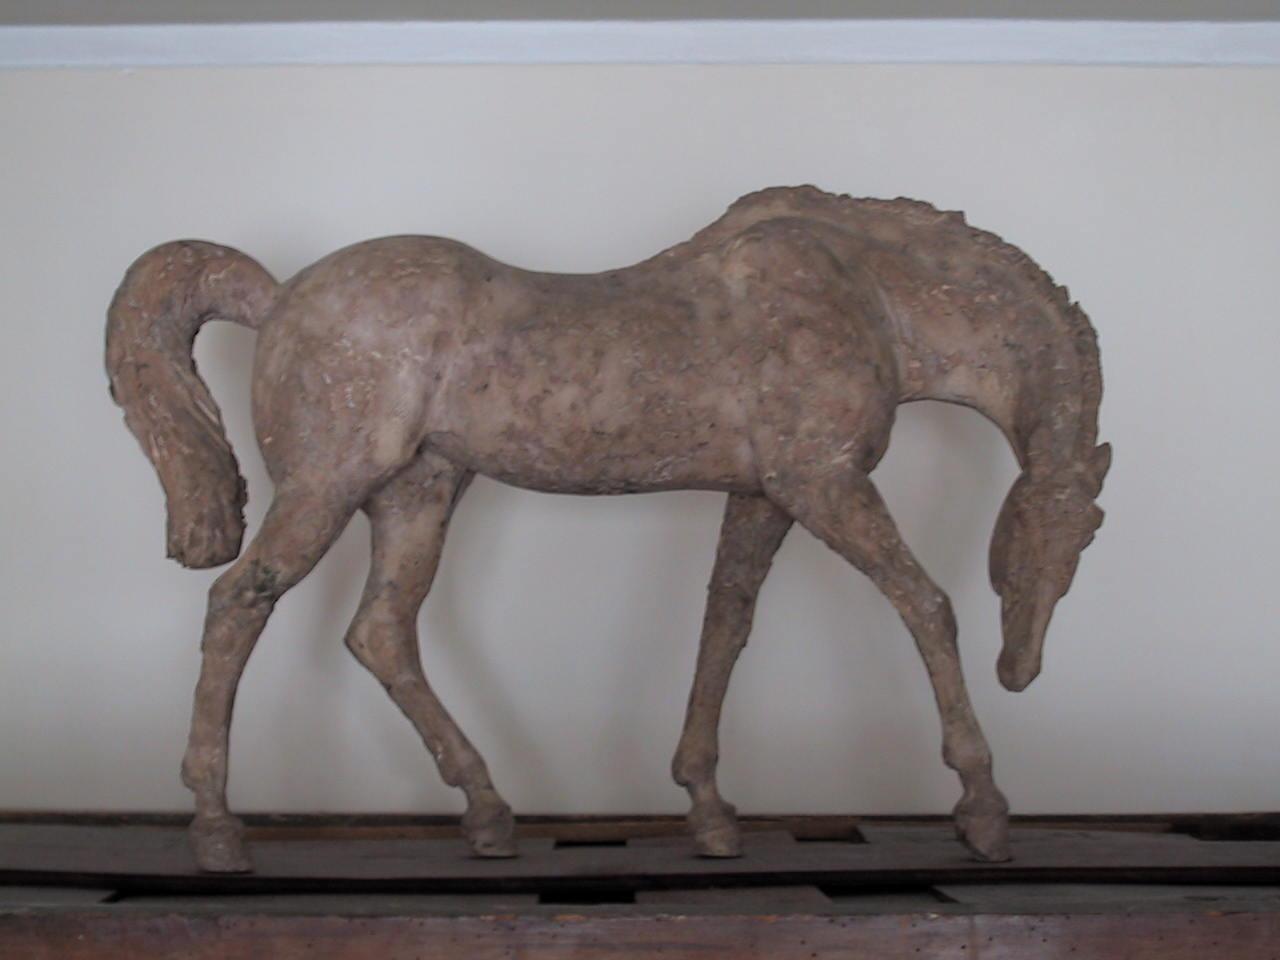 polybeton-cheval-sur-armoire.jpg